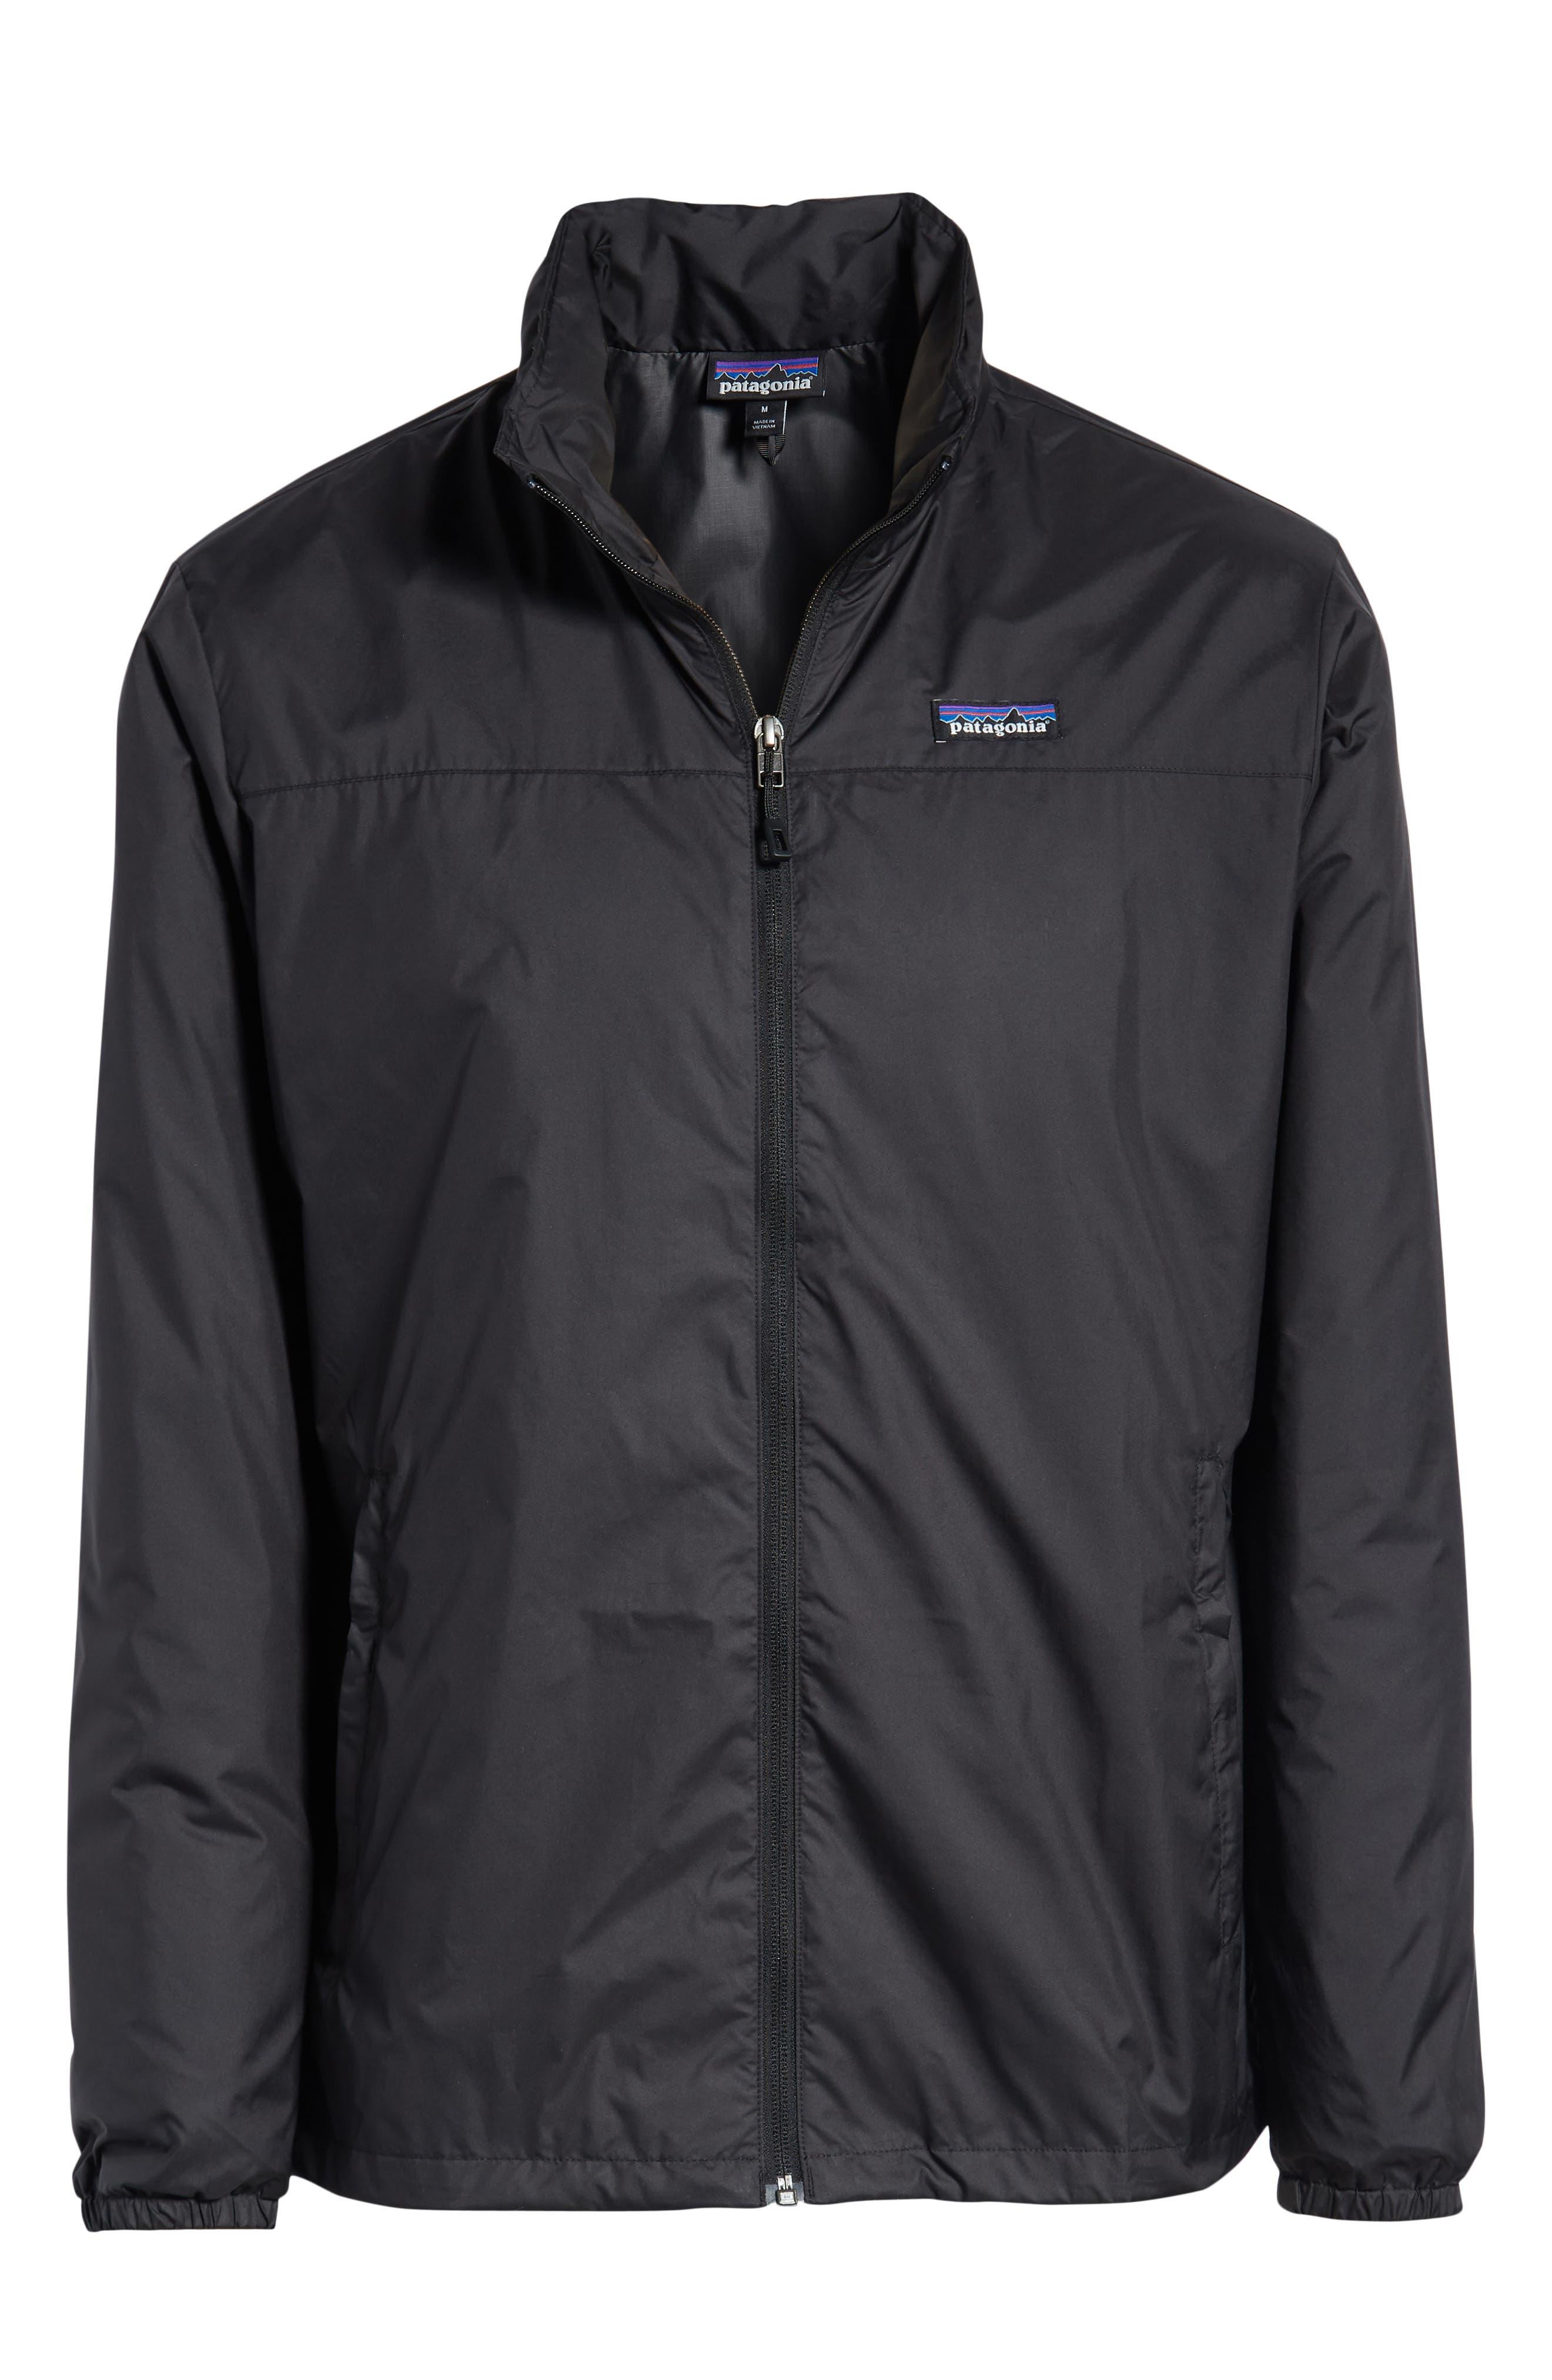 PATAGONIA, Light & Variable<sup>™</sup> Wind & Water Resistant Hooded Jacket, Alternate thumbnail 6, color, INK BLACK